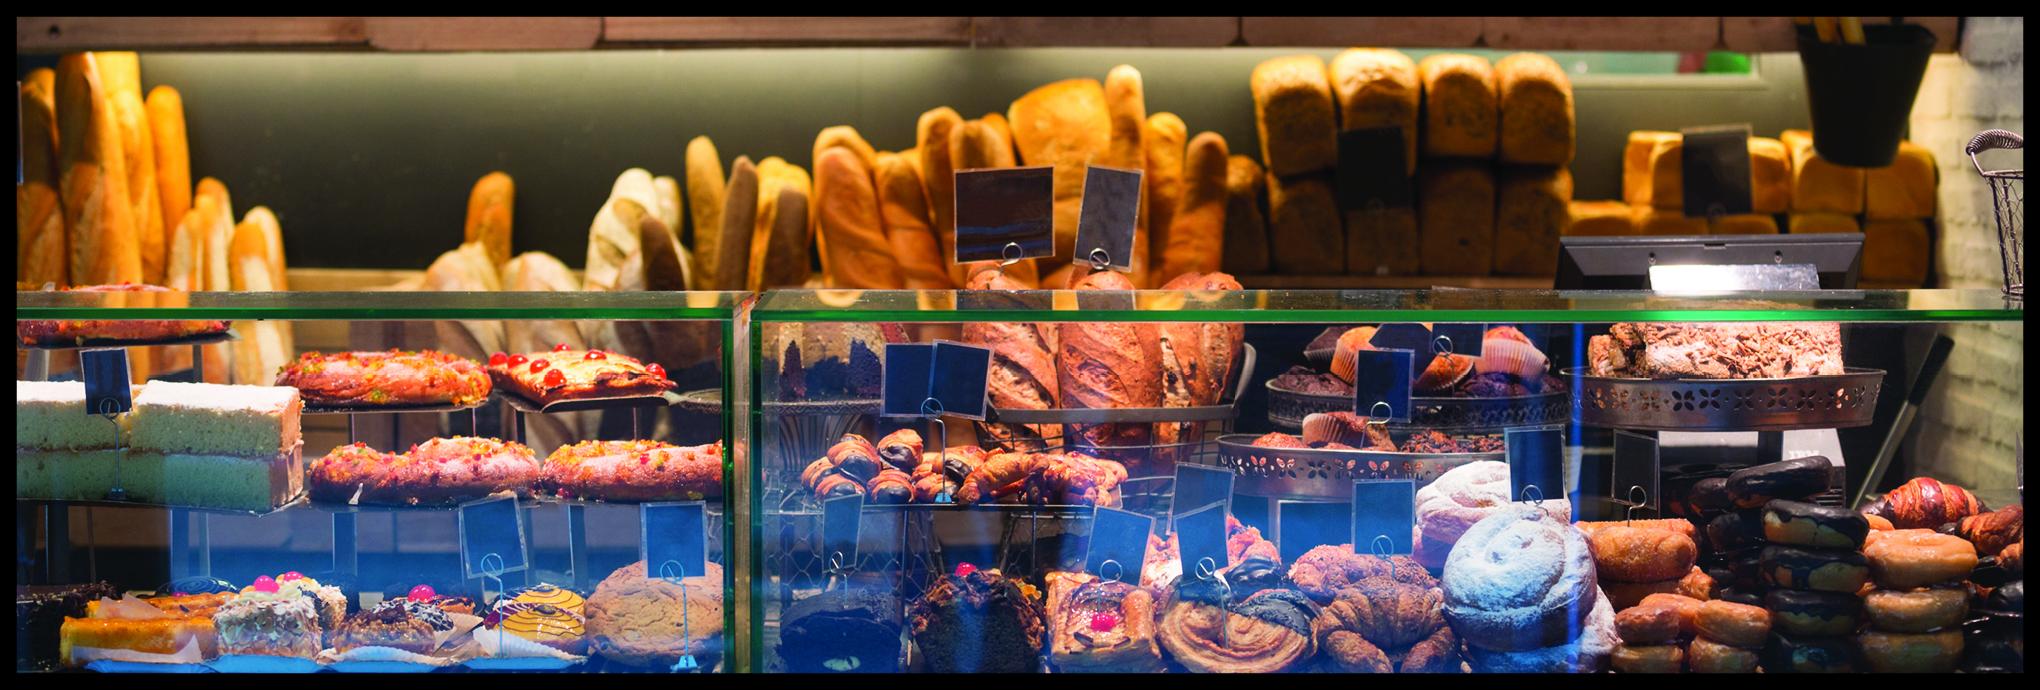 bakery trends 2015